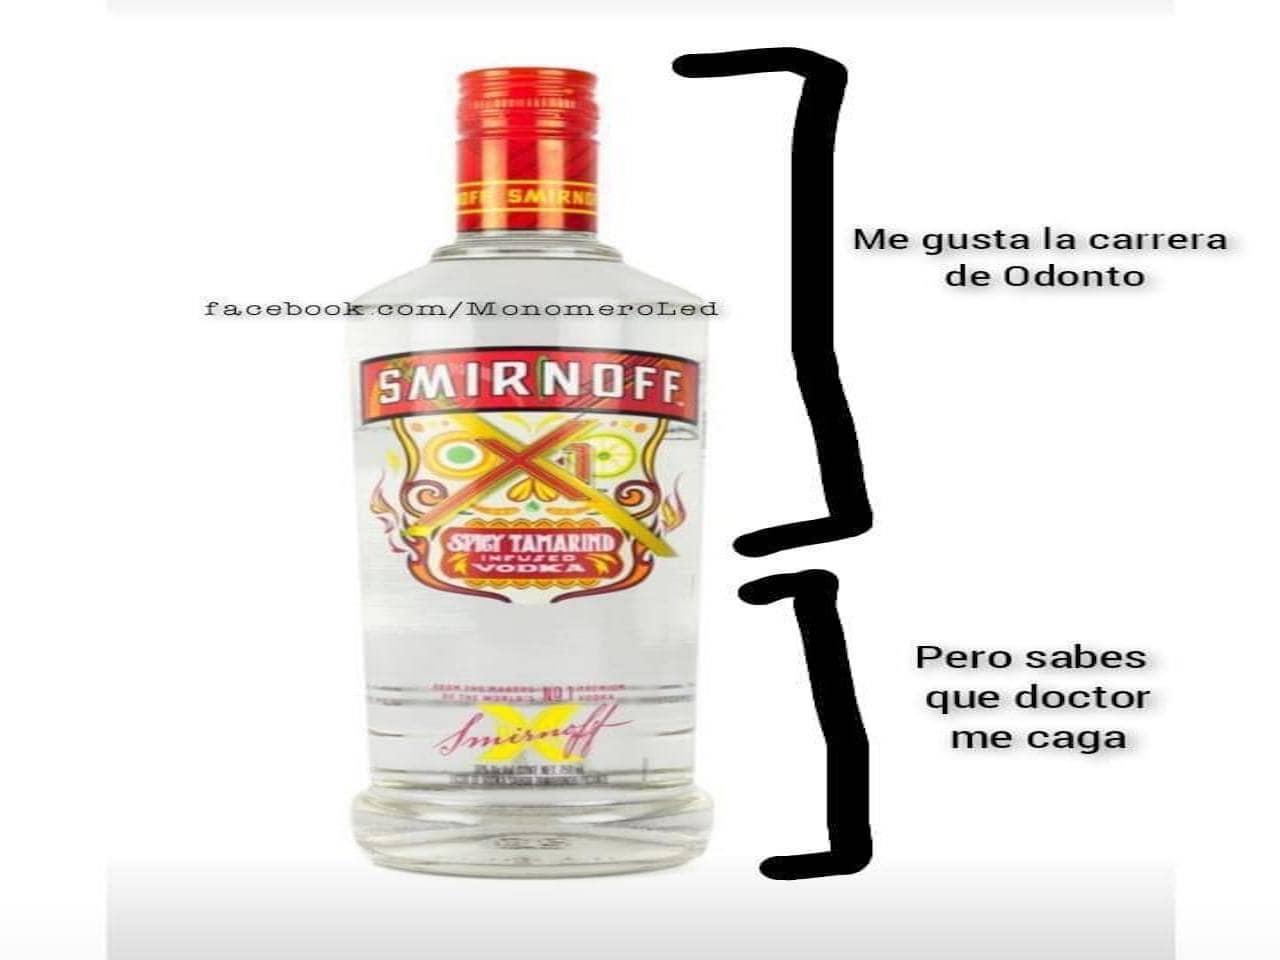 Meme de rayitas con Smirnoff de tamarindo